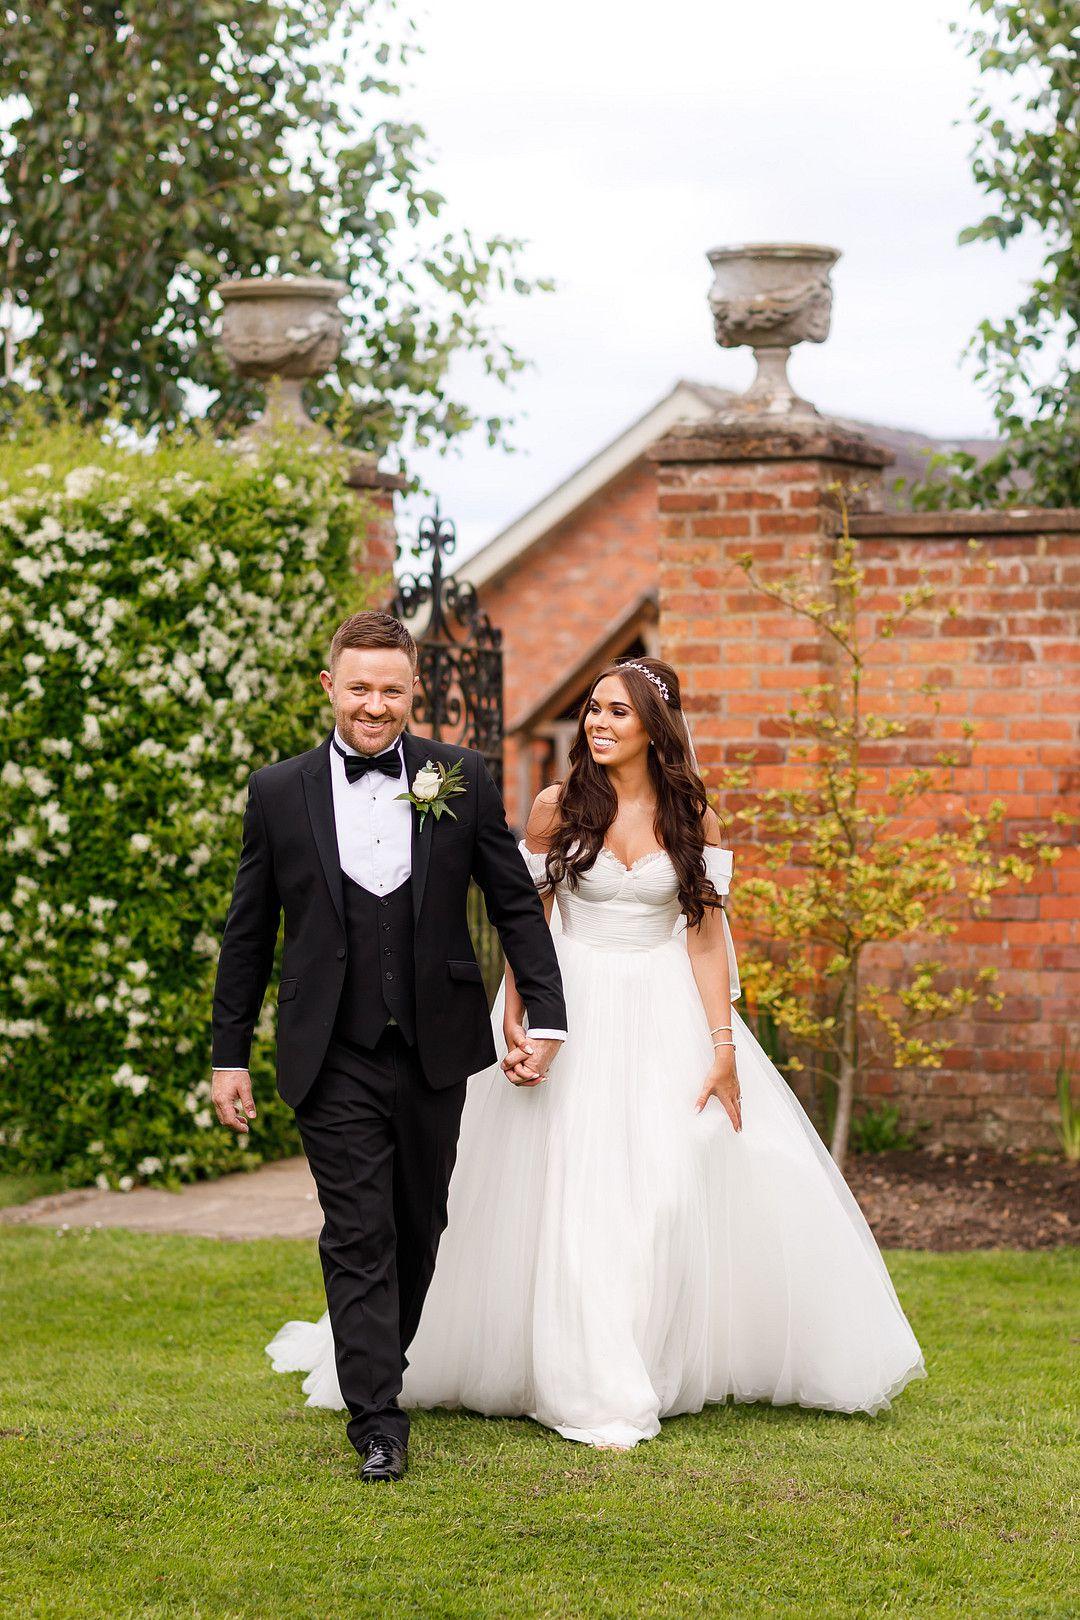 bride and groom at elegant summer wedding walking hand in hand